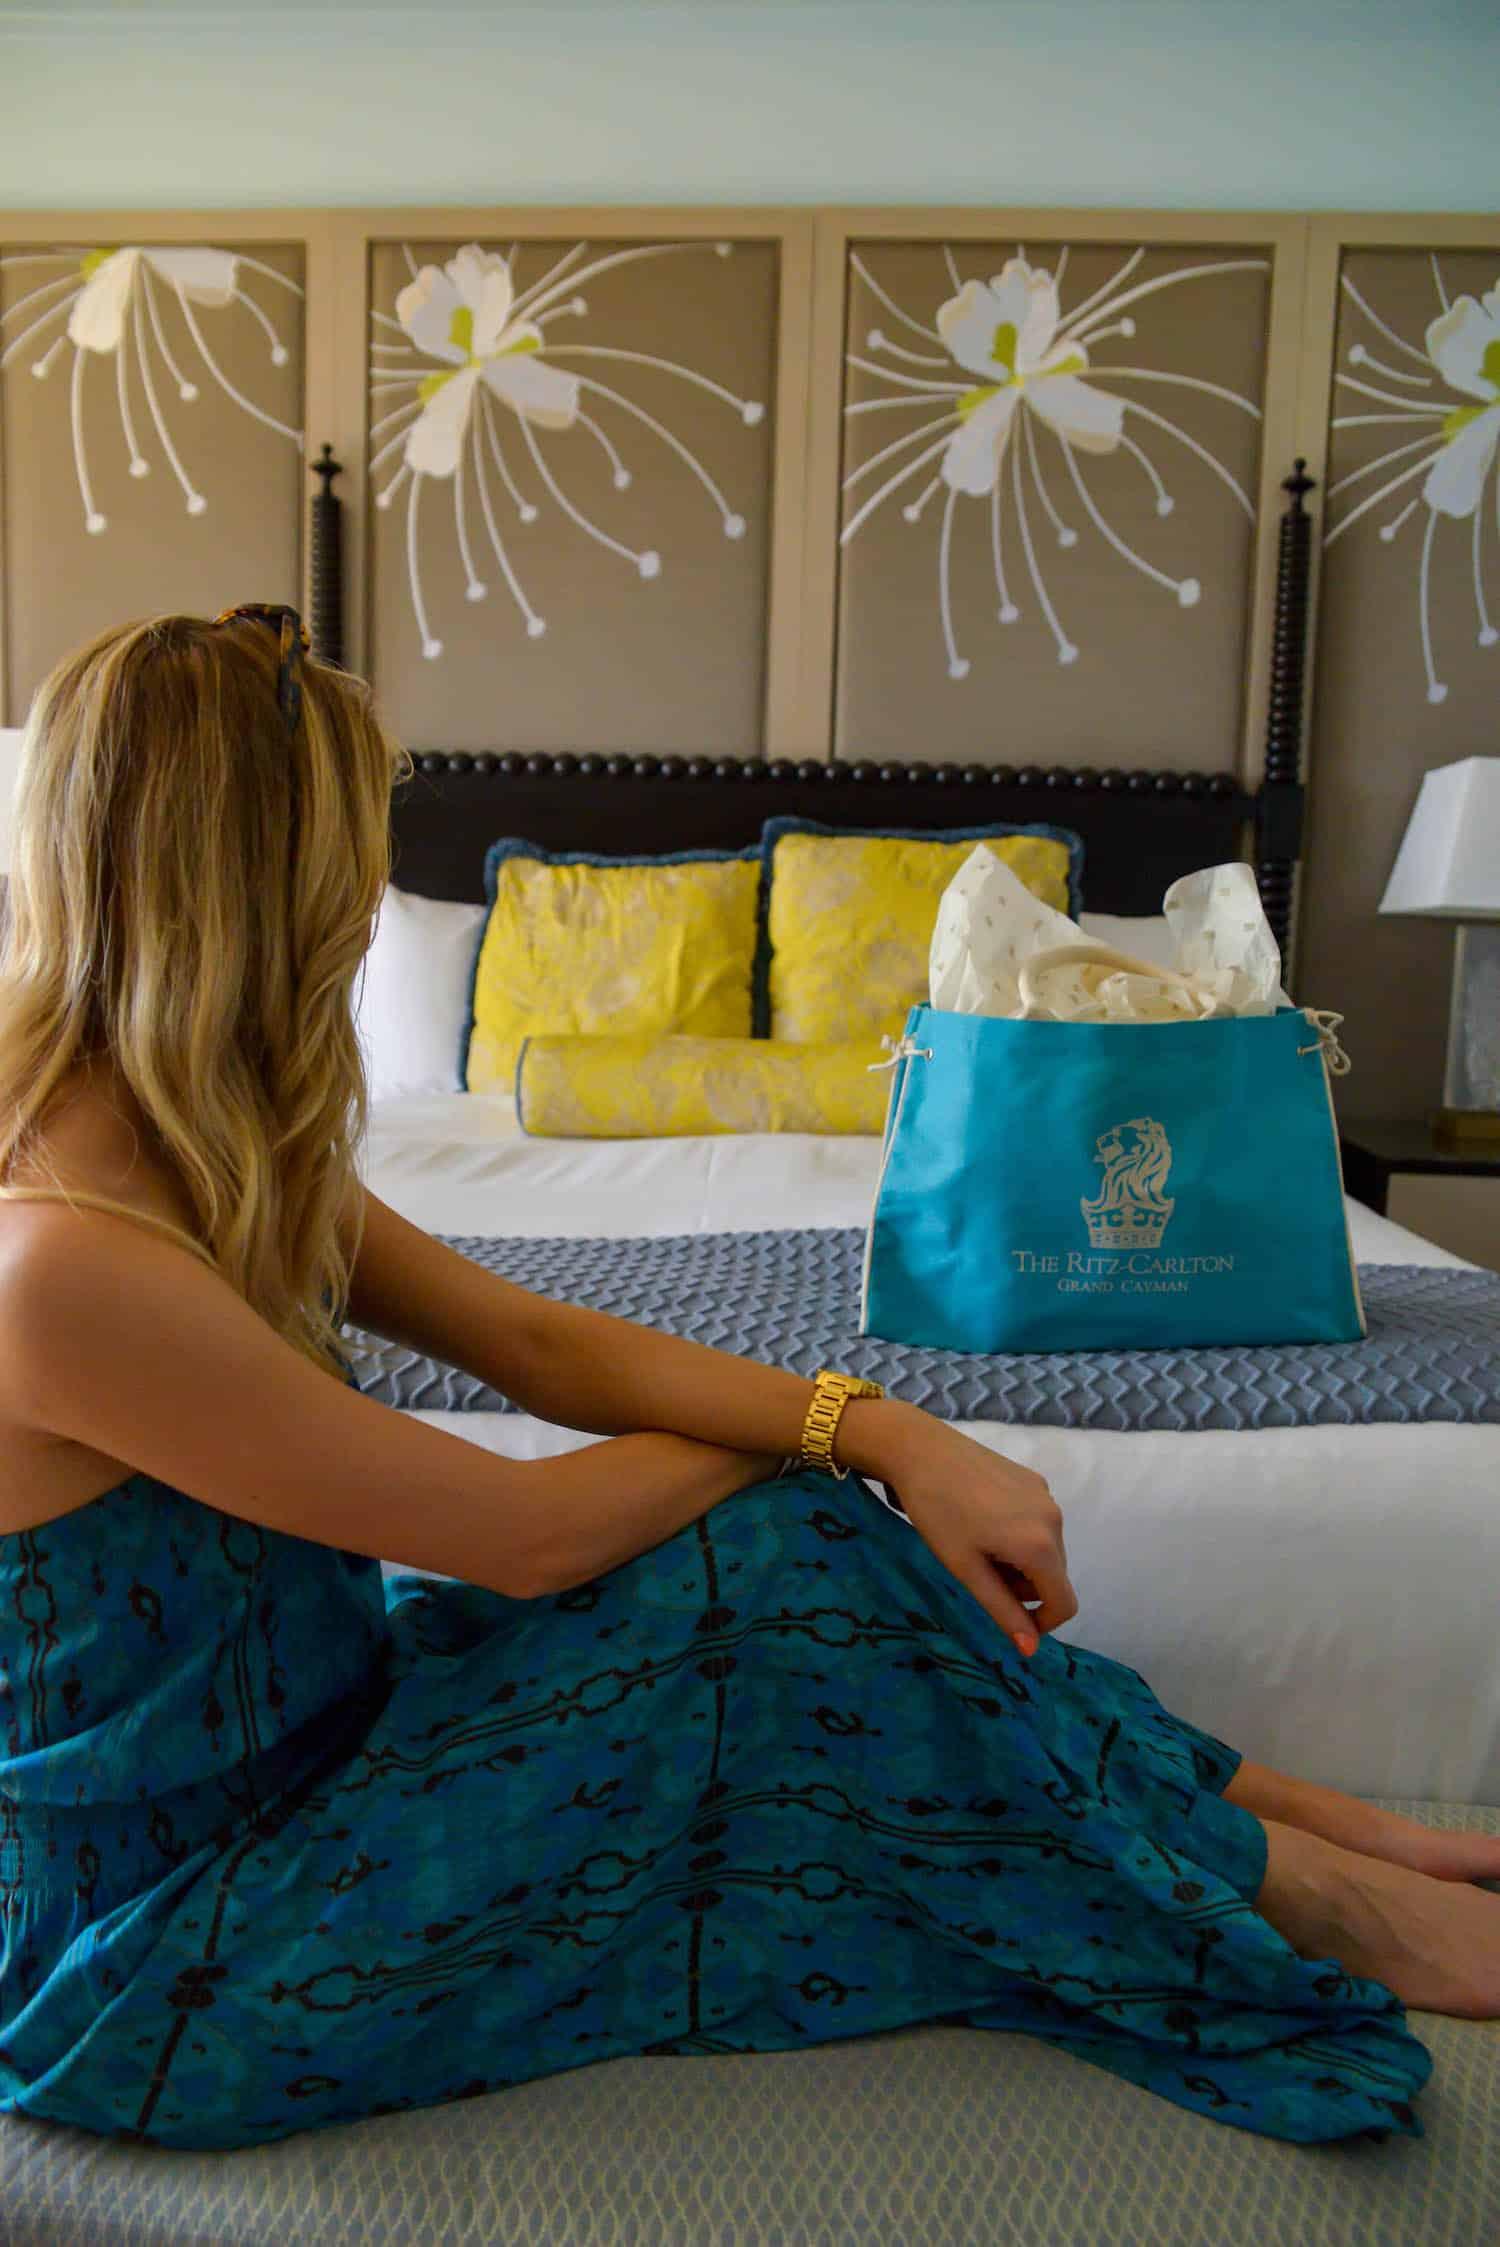 Ritz-Carlton Grand Cayman Guest Room